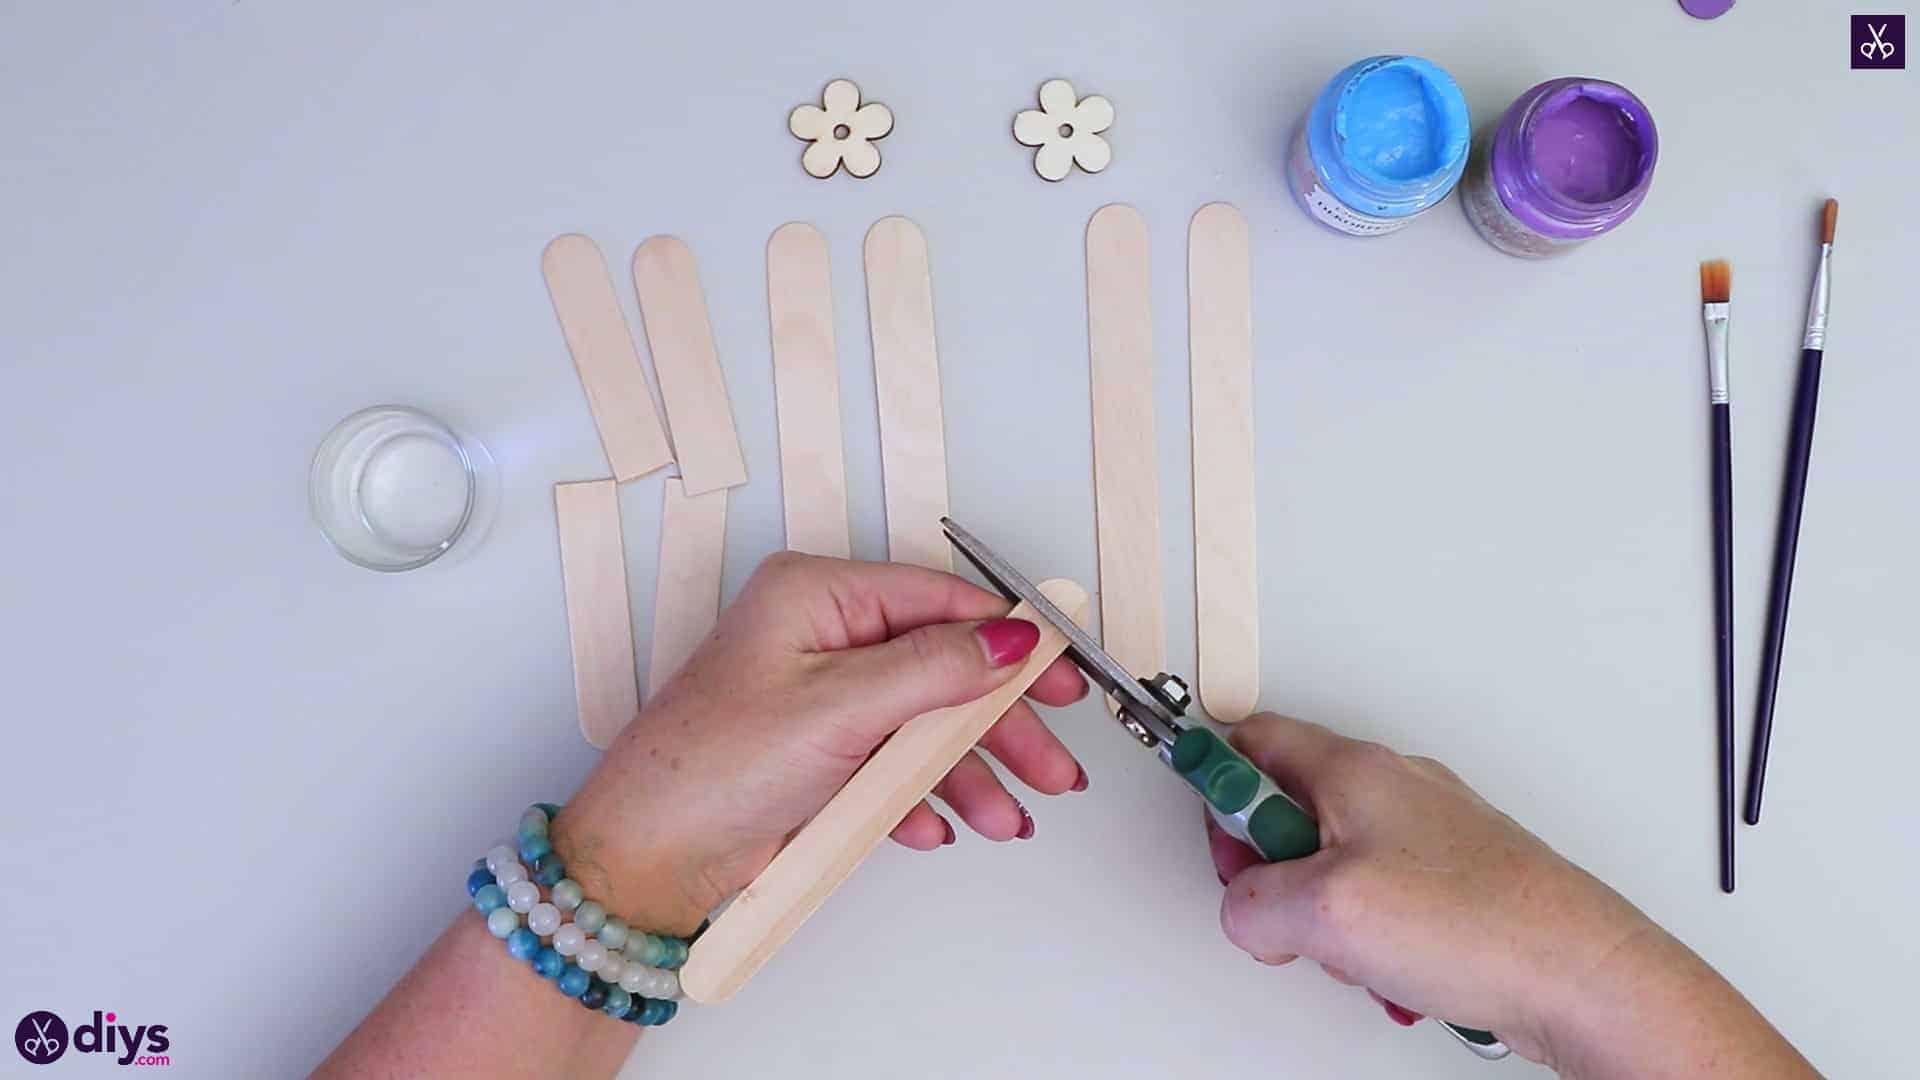 Popsicle stick napkin holder cutting edge